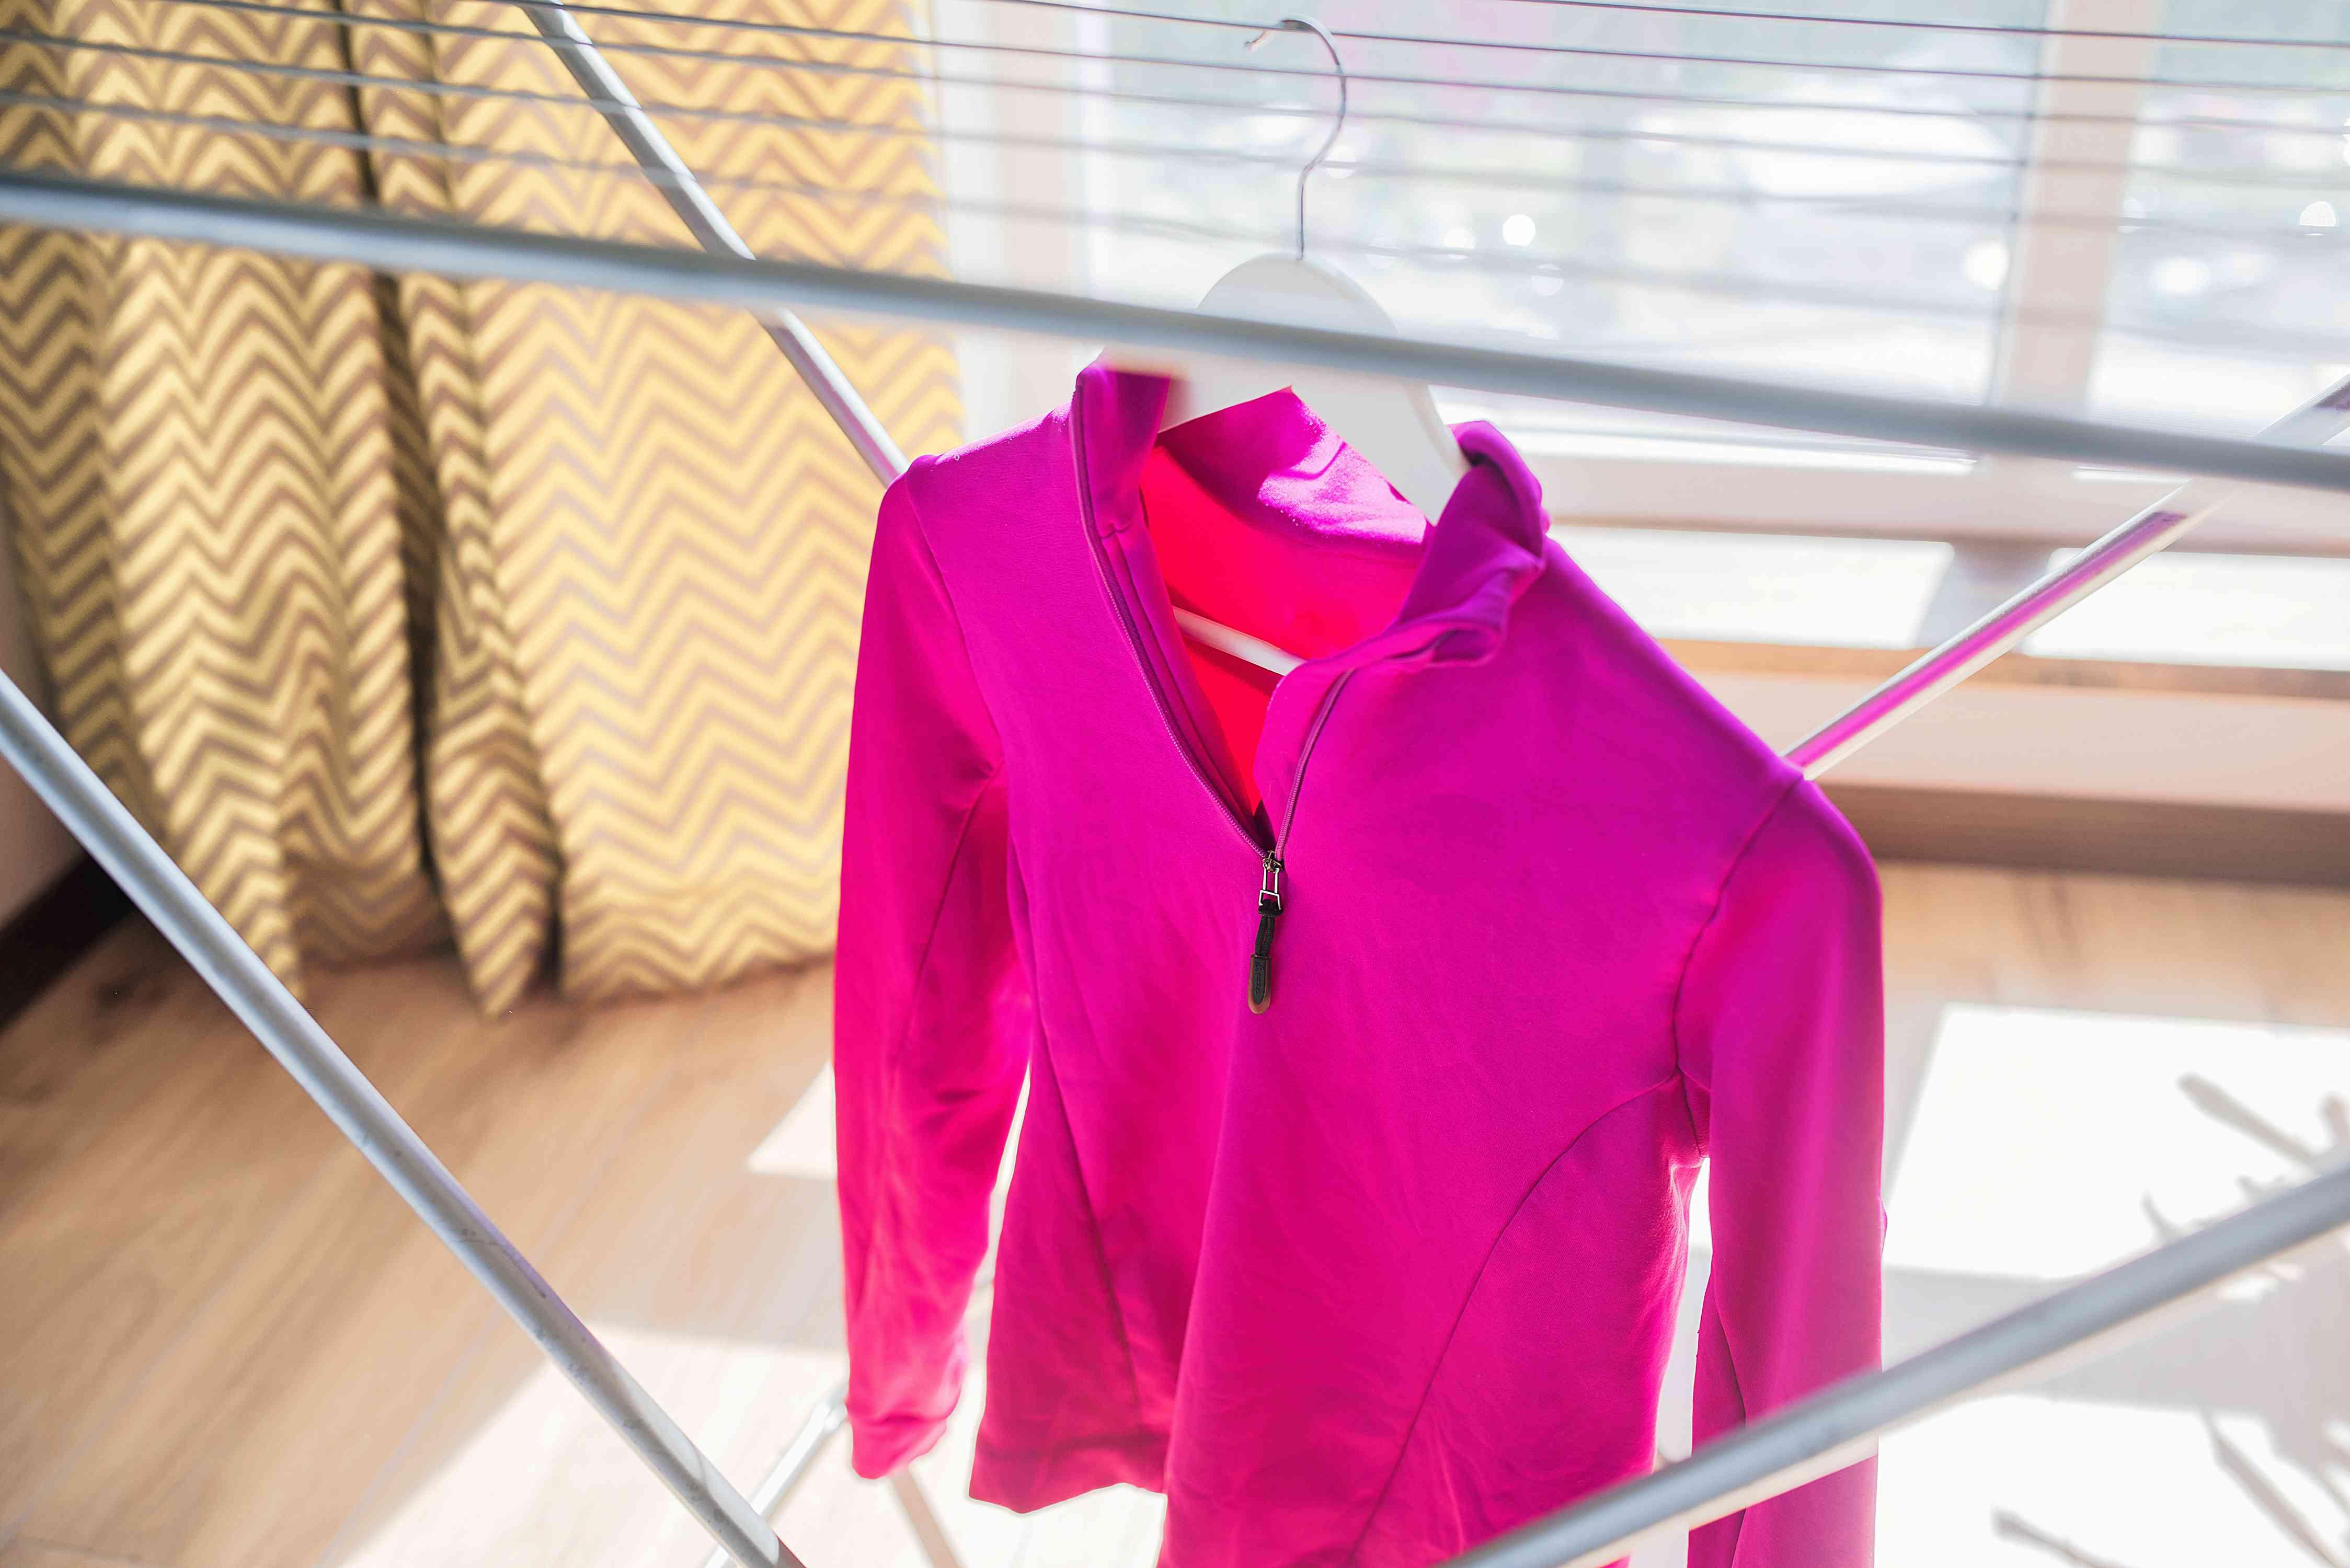 Pink fleece jacket on white hanger air drying on metal drying rack